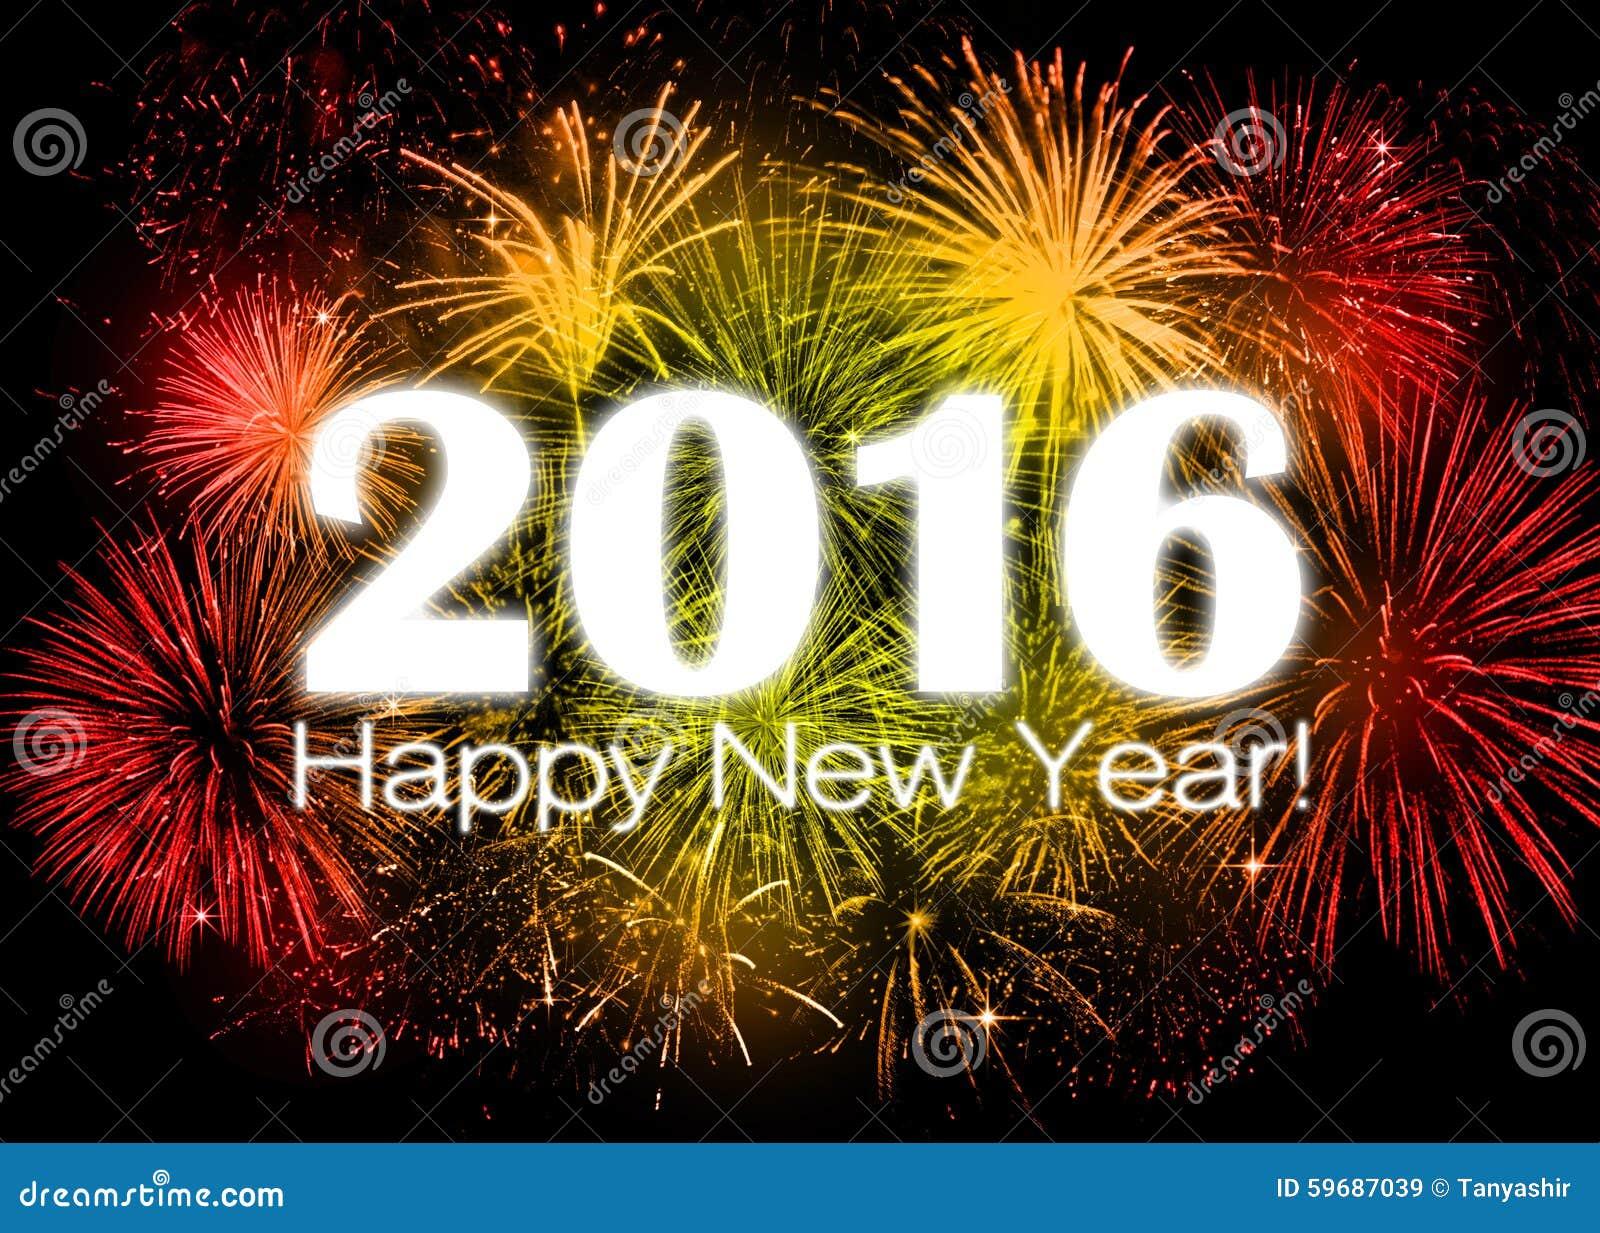 2016 Happy New Year